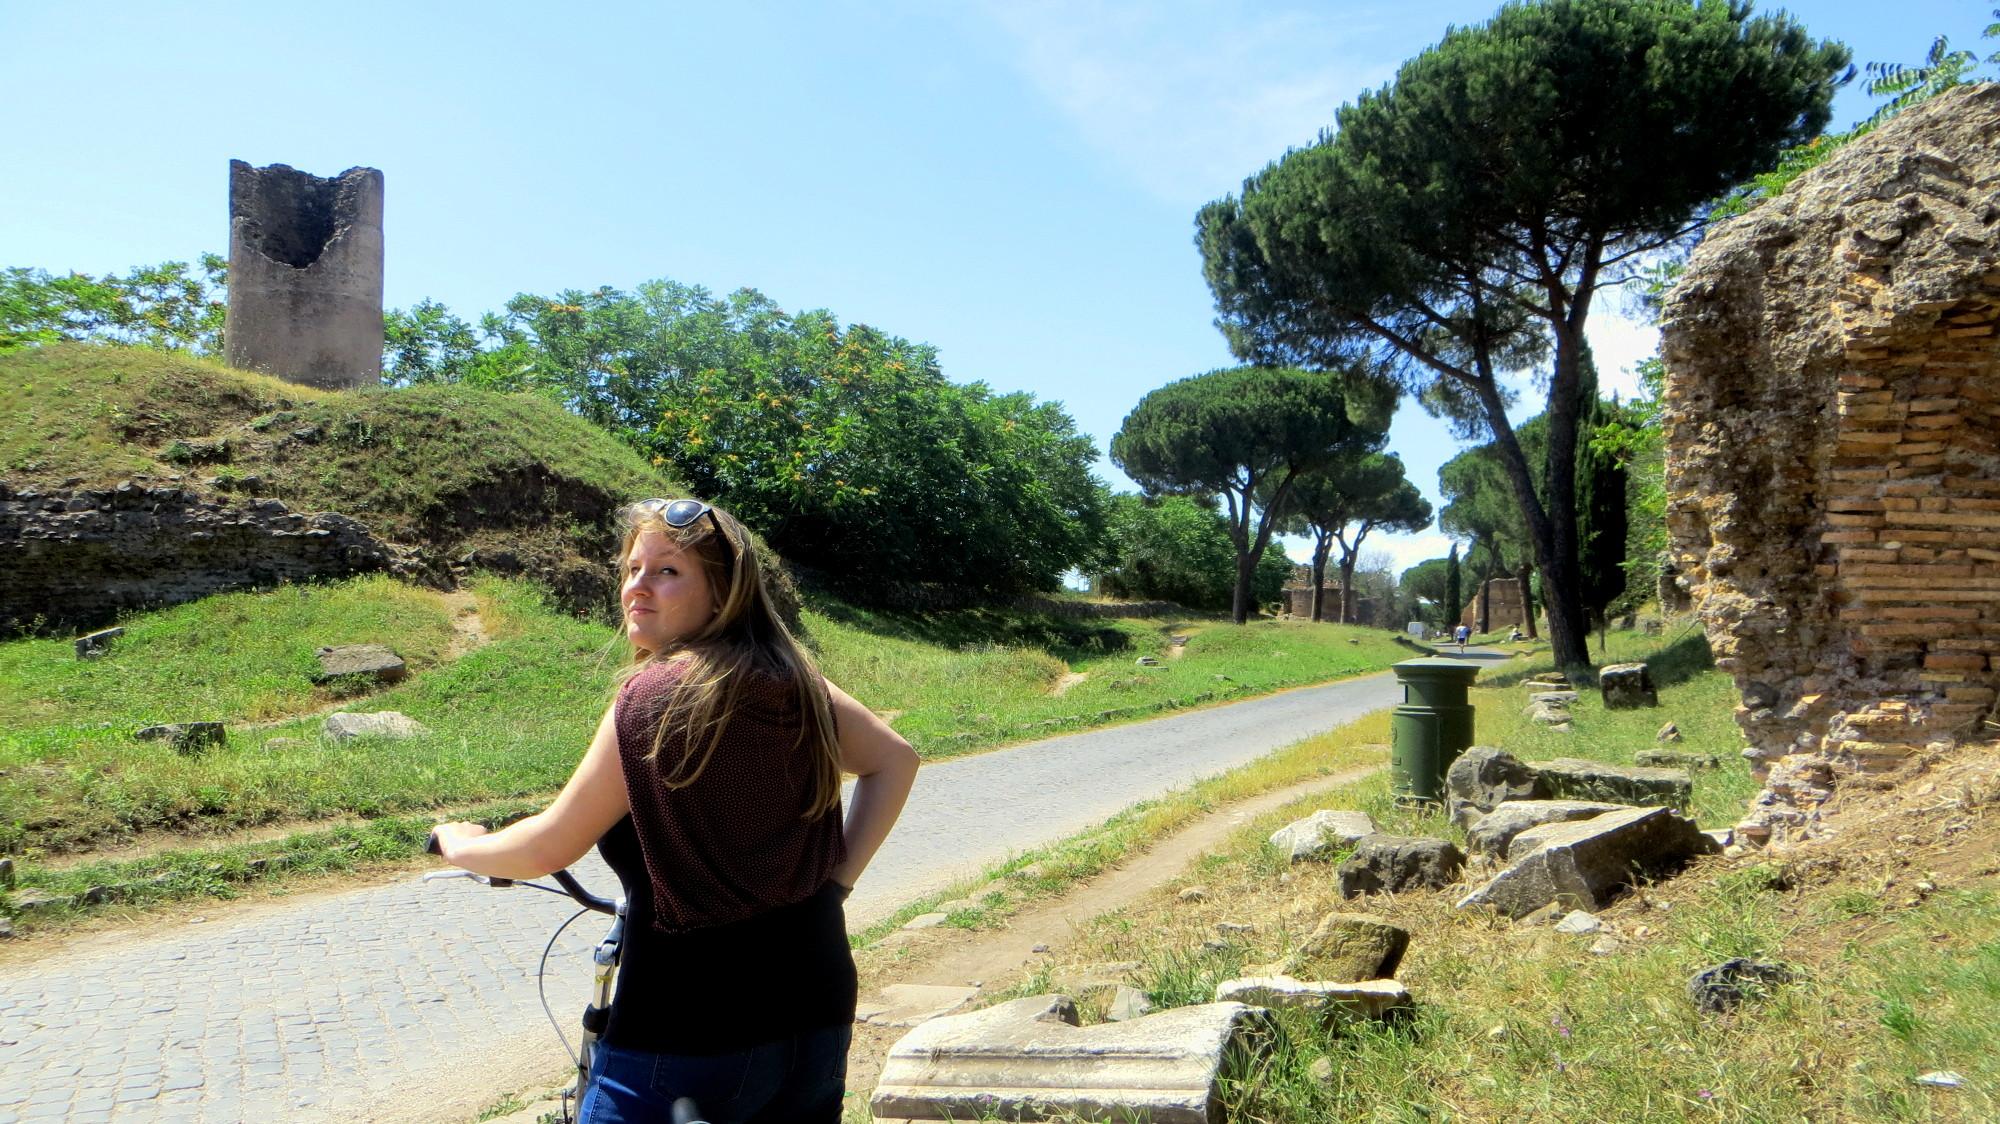 Kathi Hofmann auf der Via Appia Antica in Rom